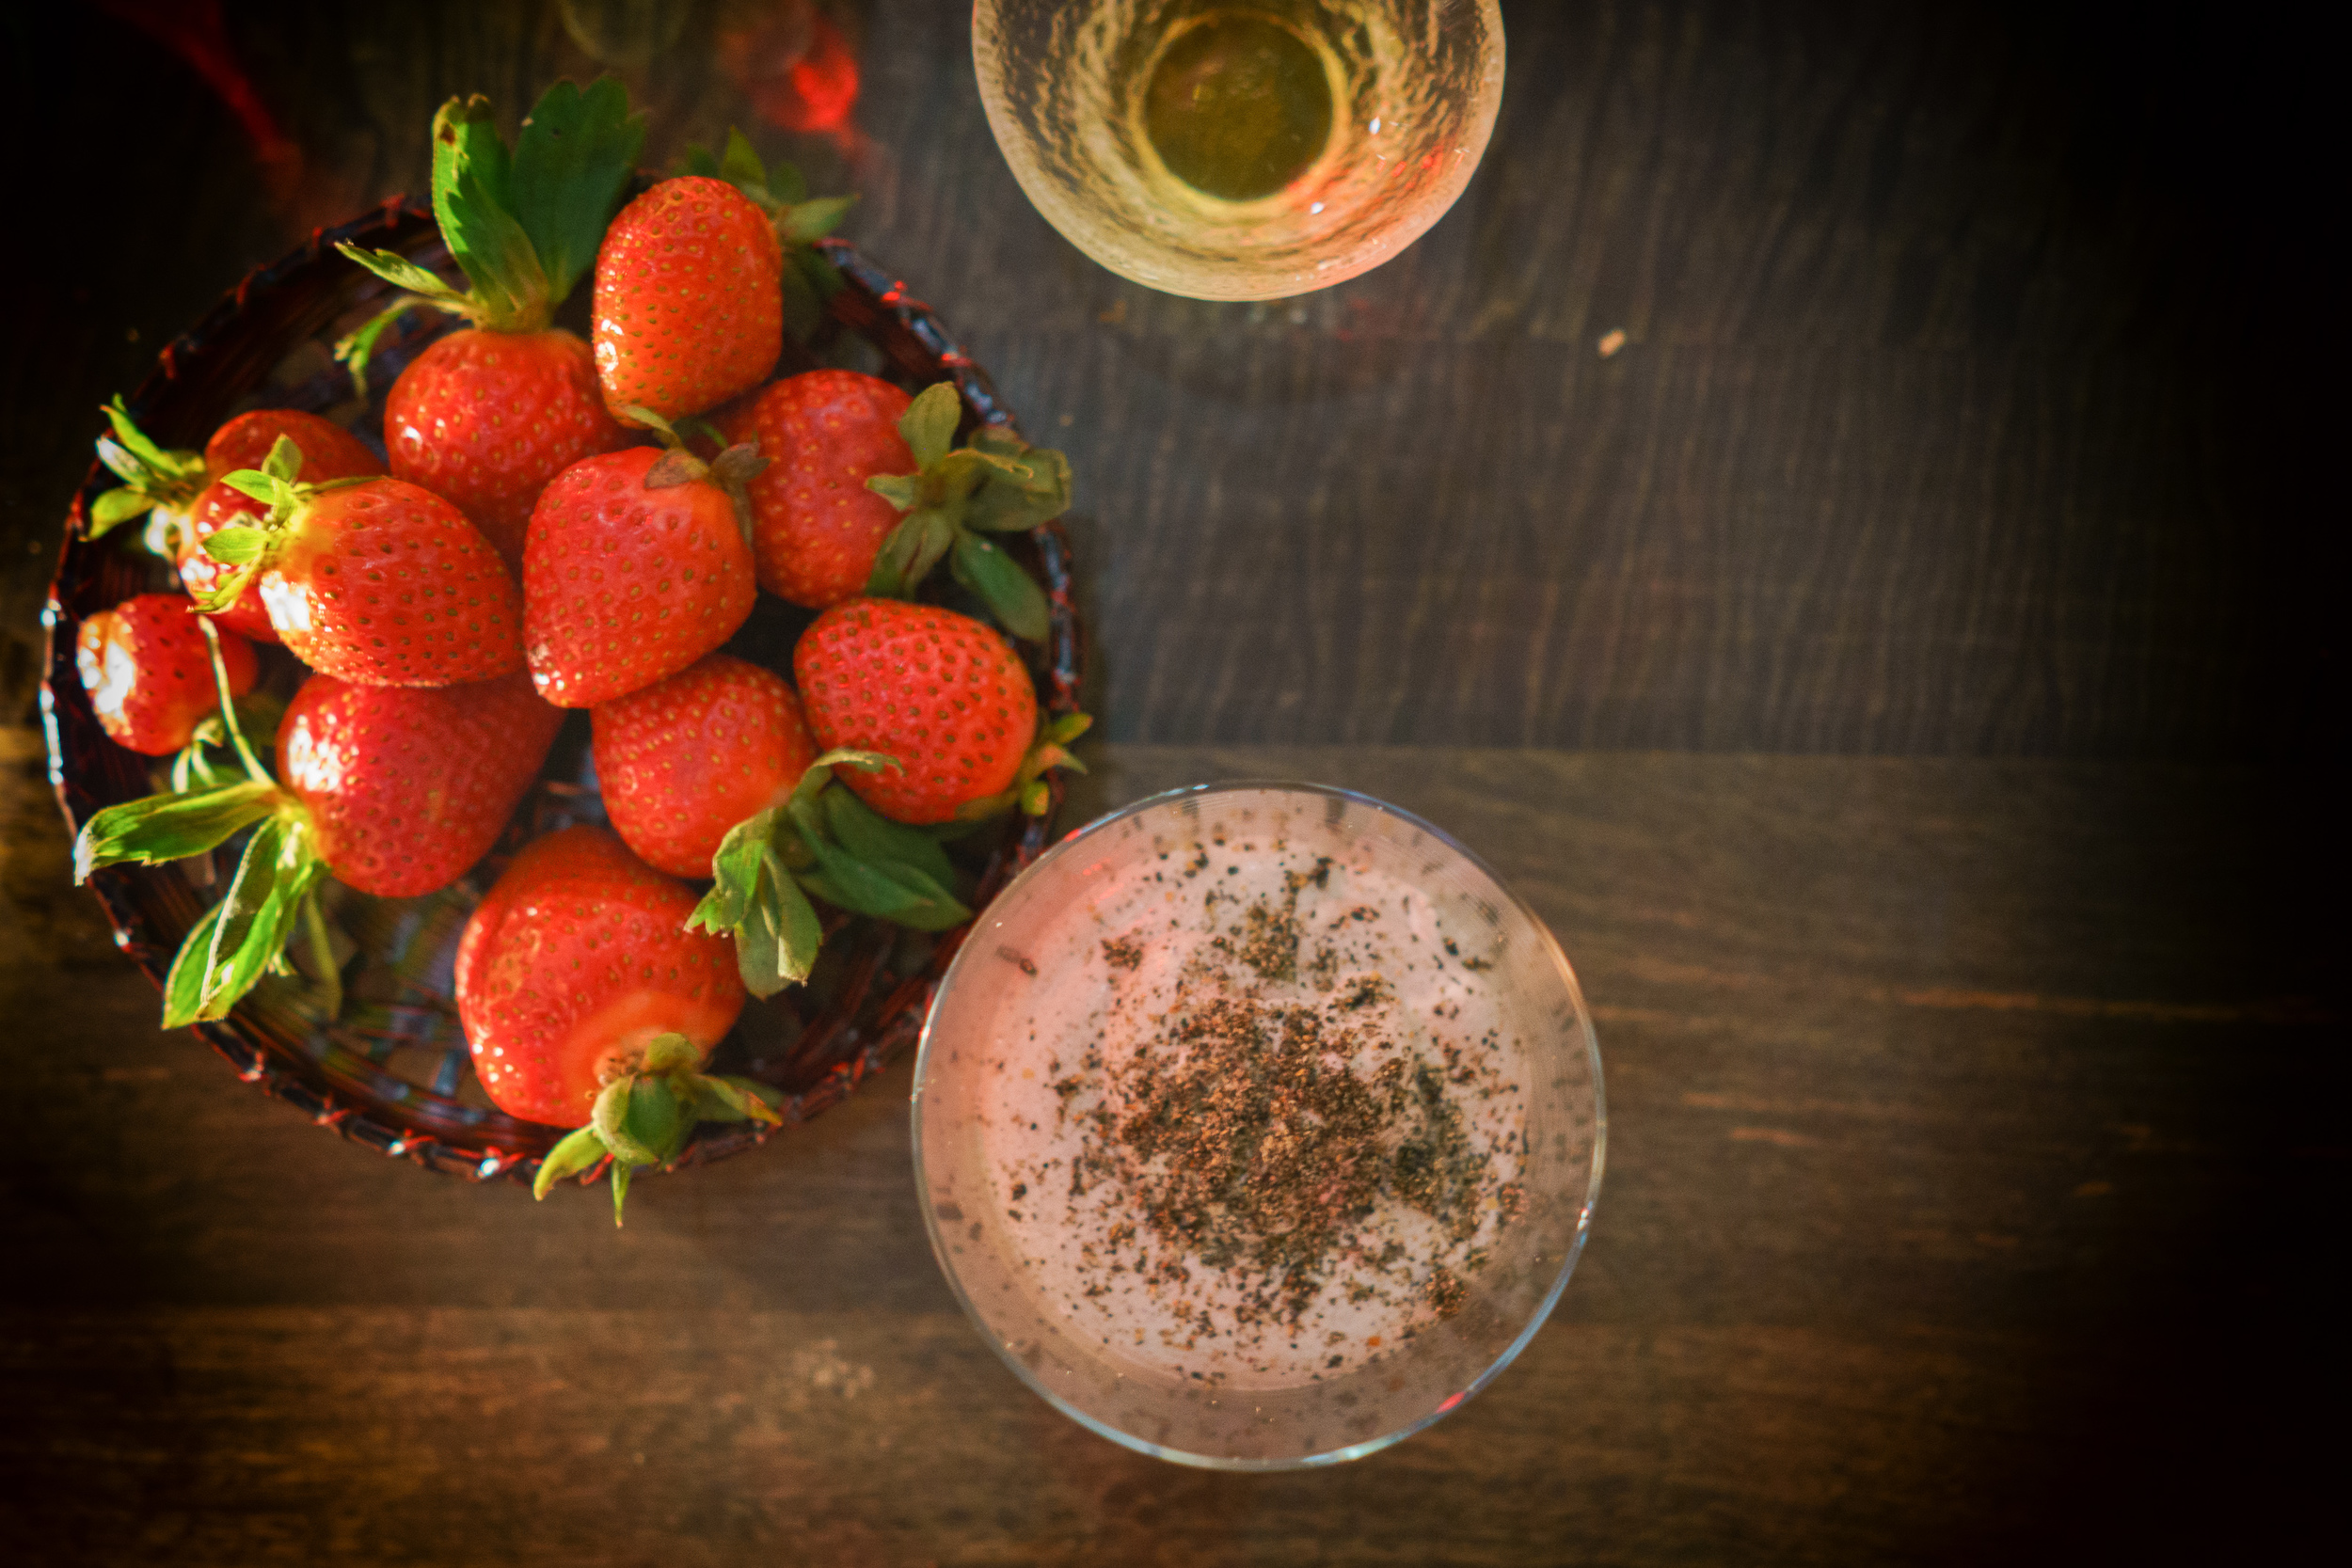 Strawberries and black sesame